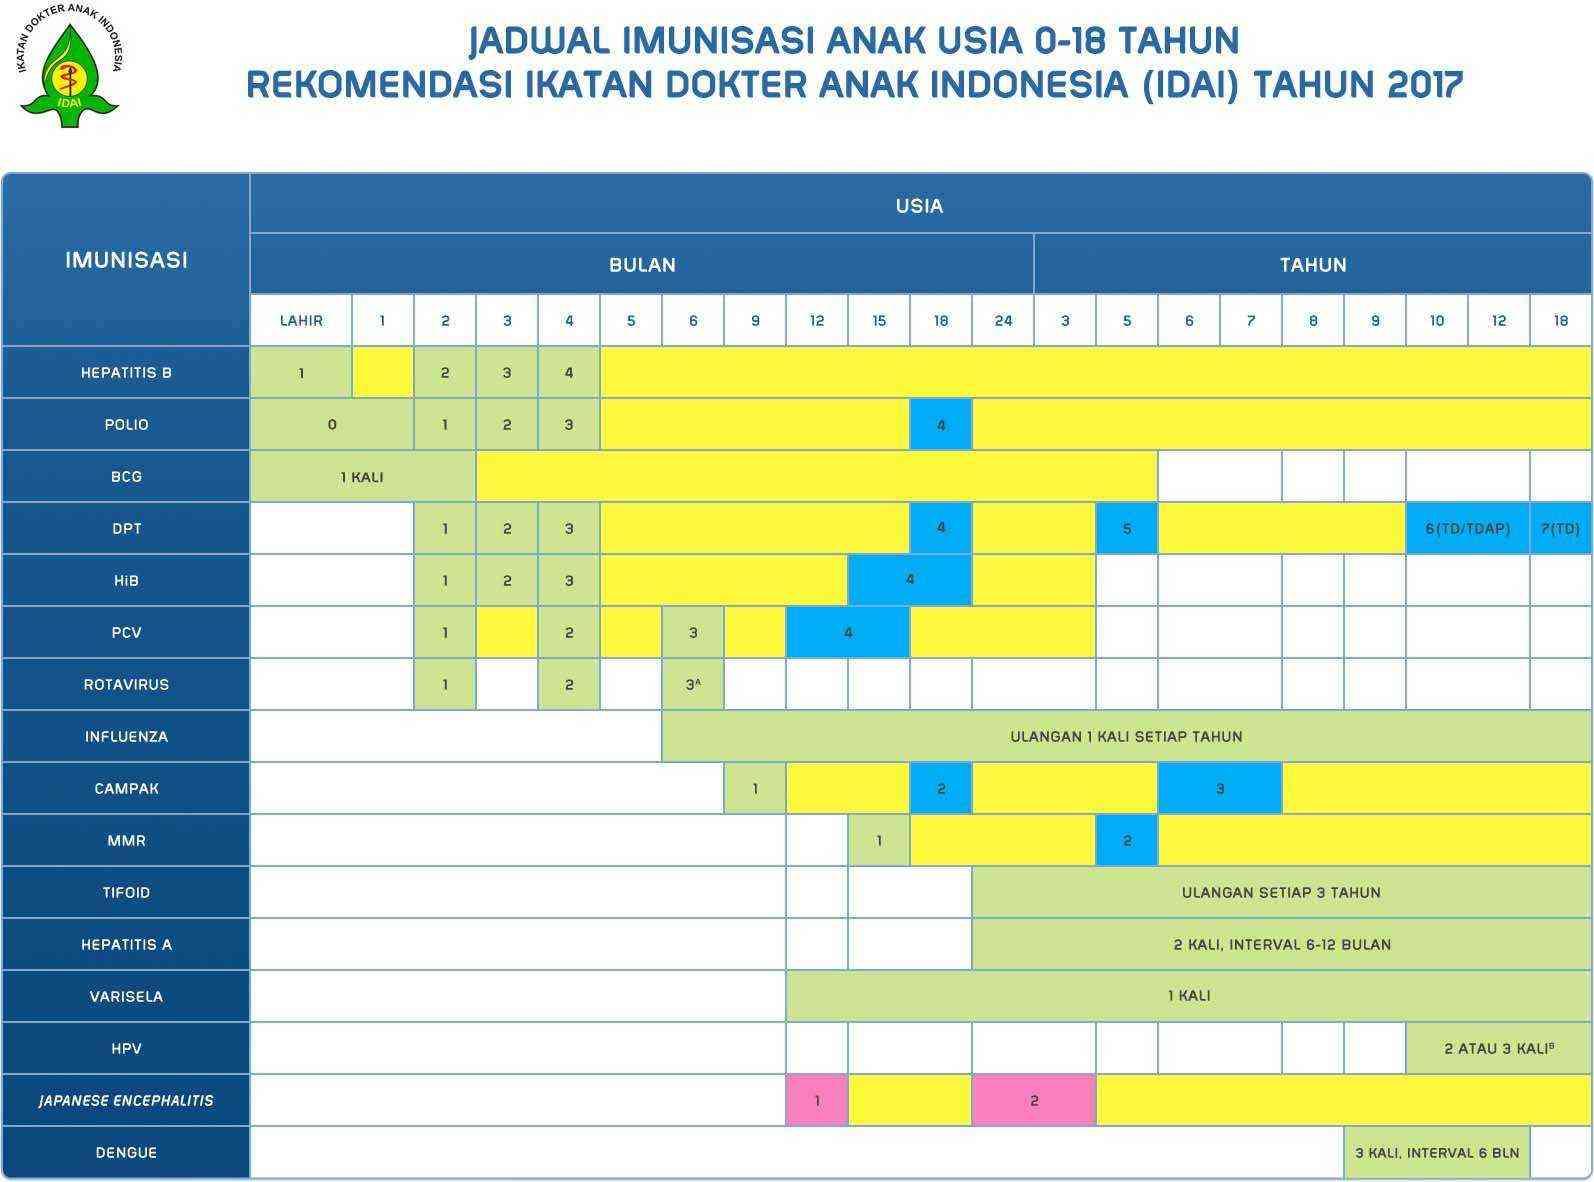 Tabel Jadwal Imunisasi Anak Usia 0-18 Tahun